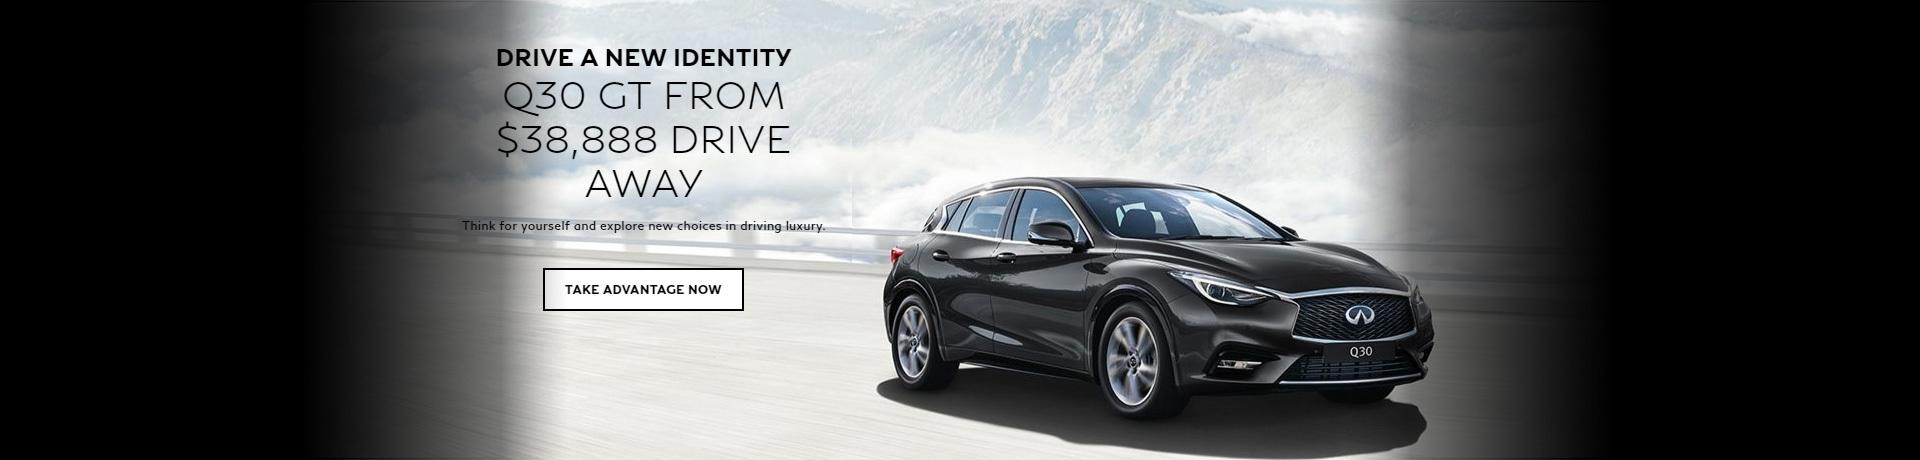 Infiniti - Drive a new identity